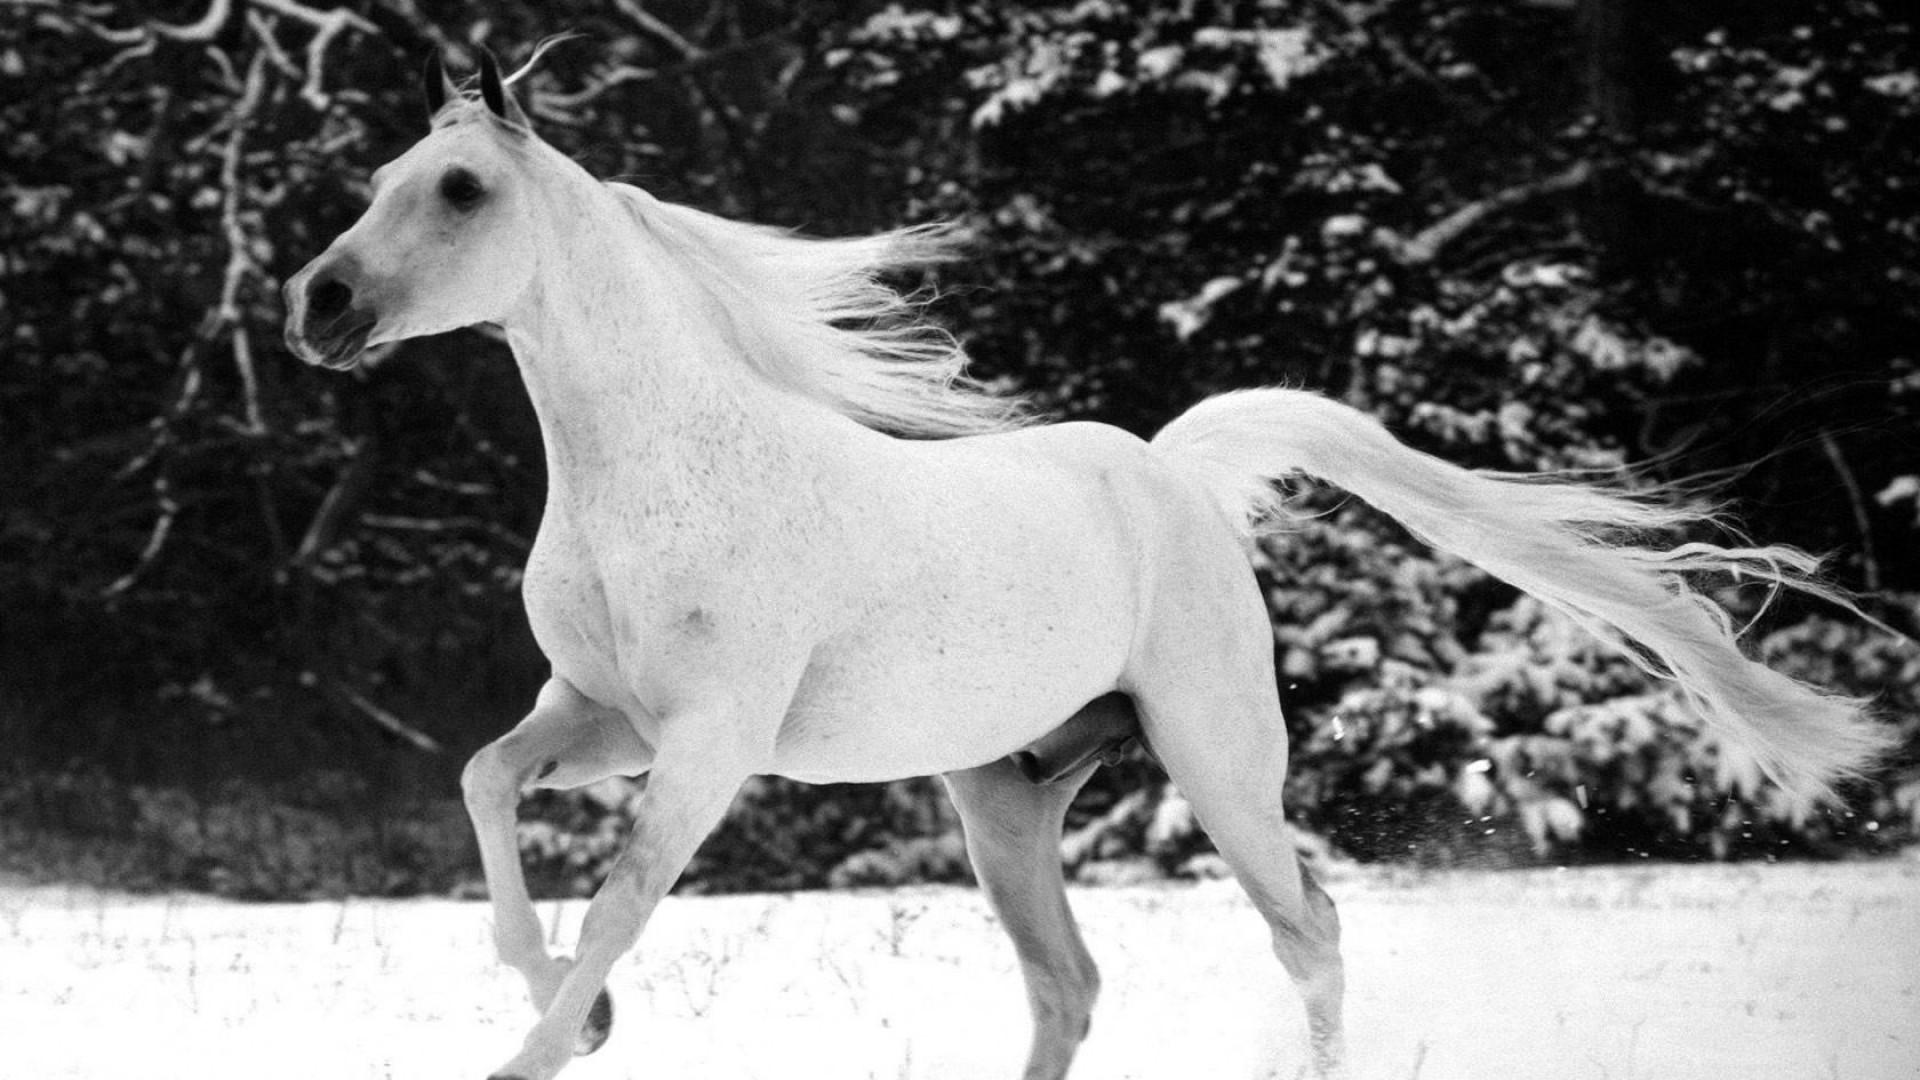 Full Hd Xxxx Horse Video 1080